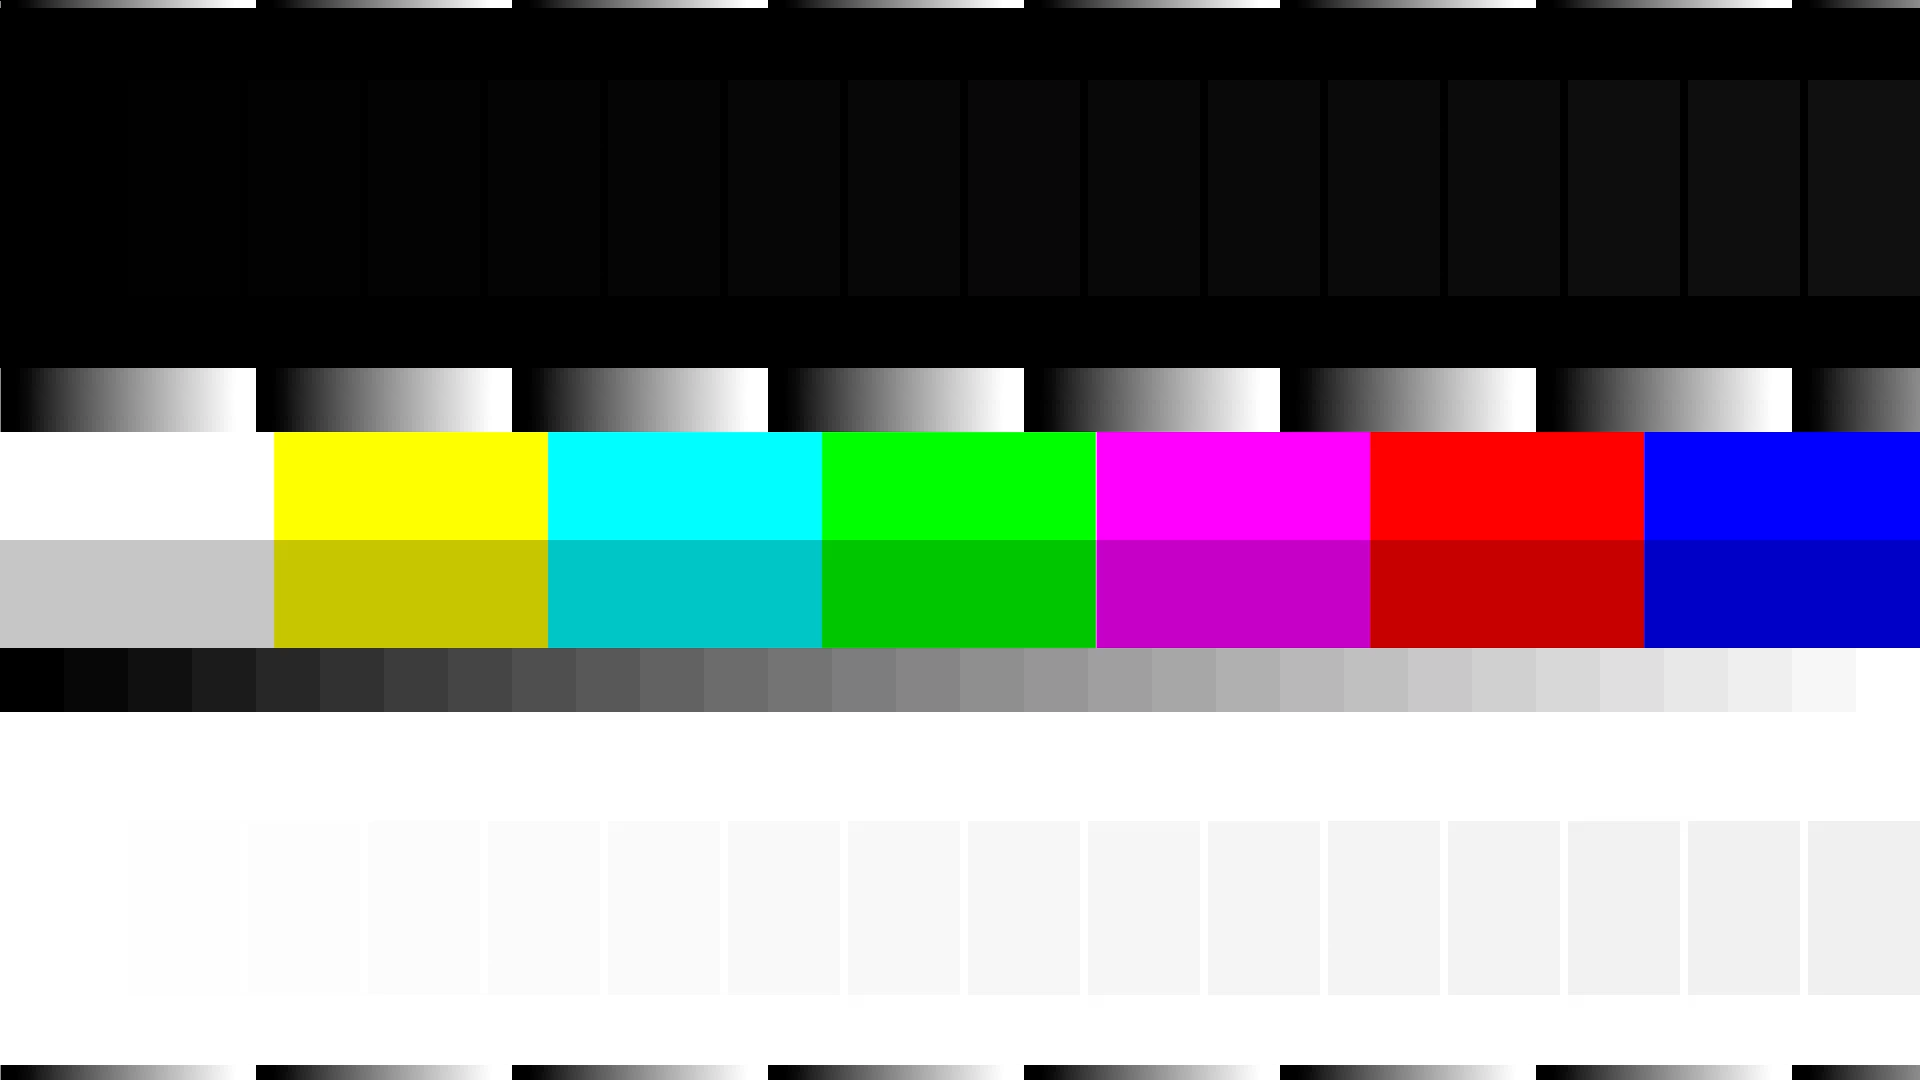 ios_decode_a196_gamma